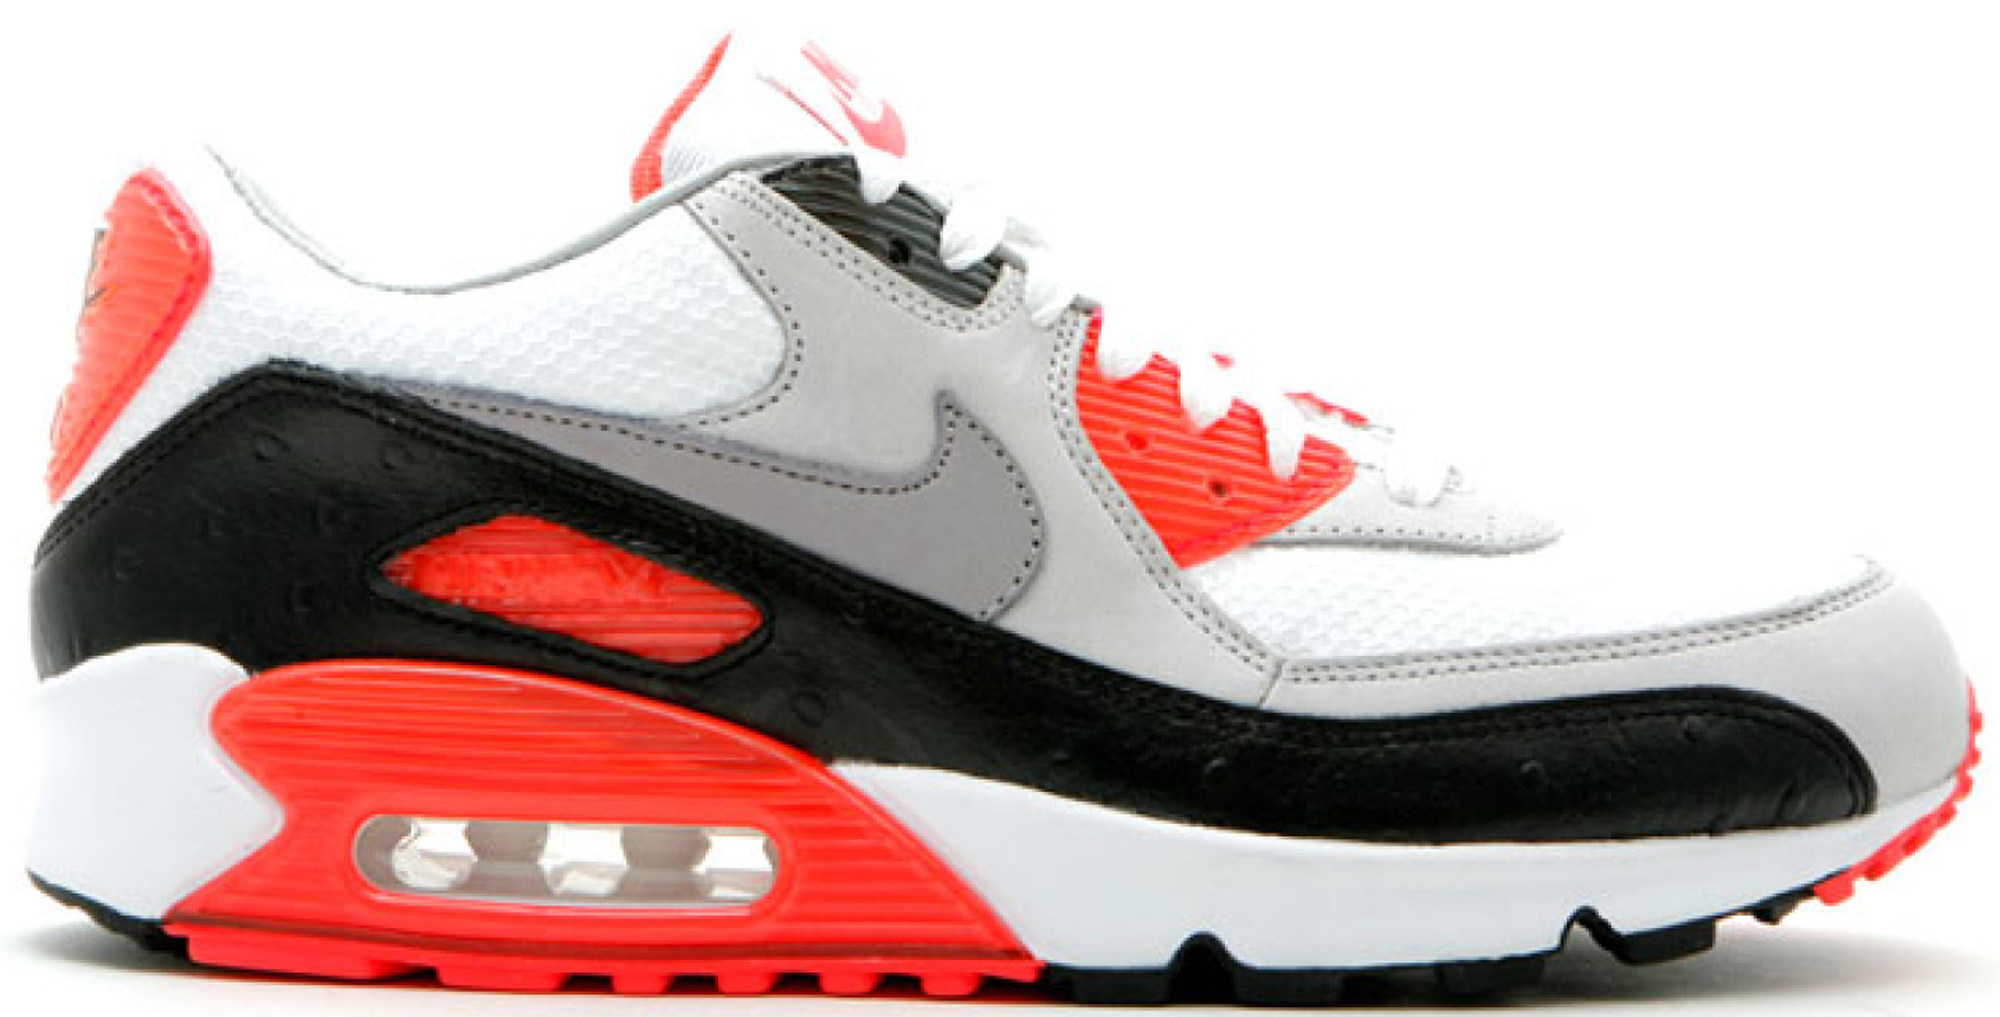 Nike Air Max 90 Infrared Ostrich